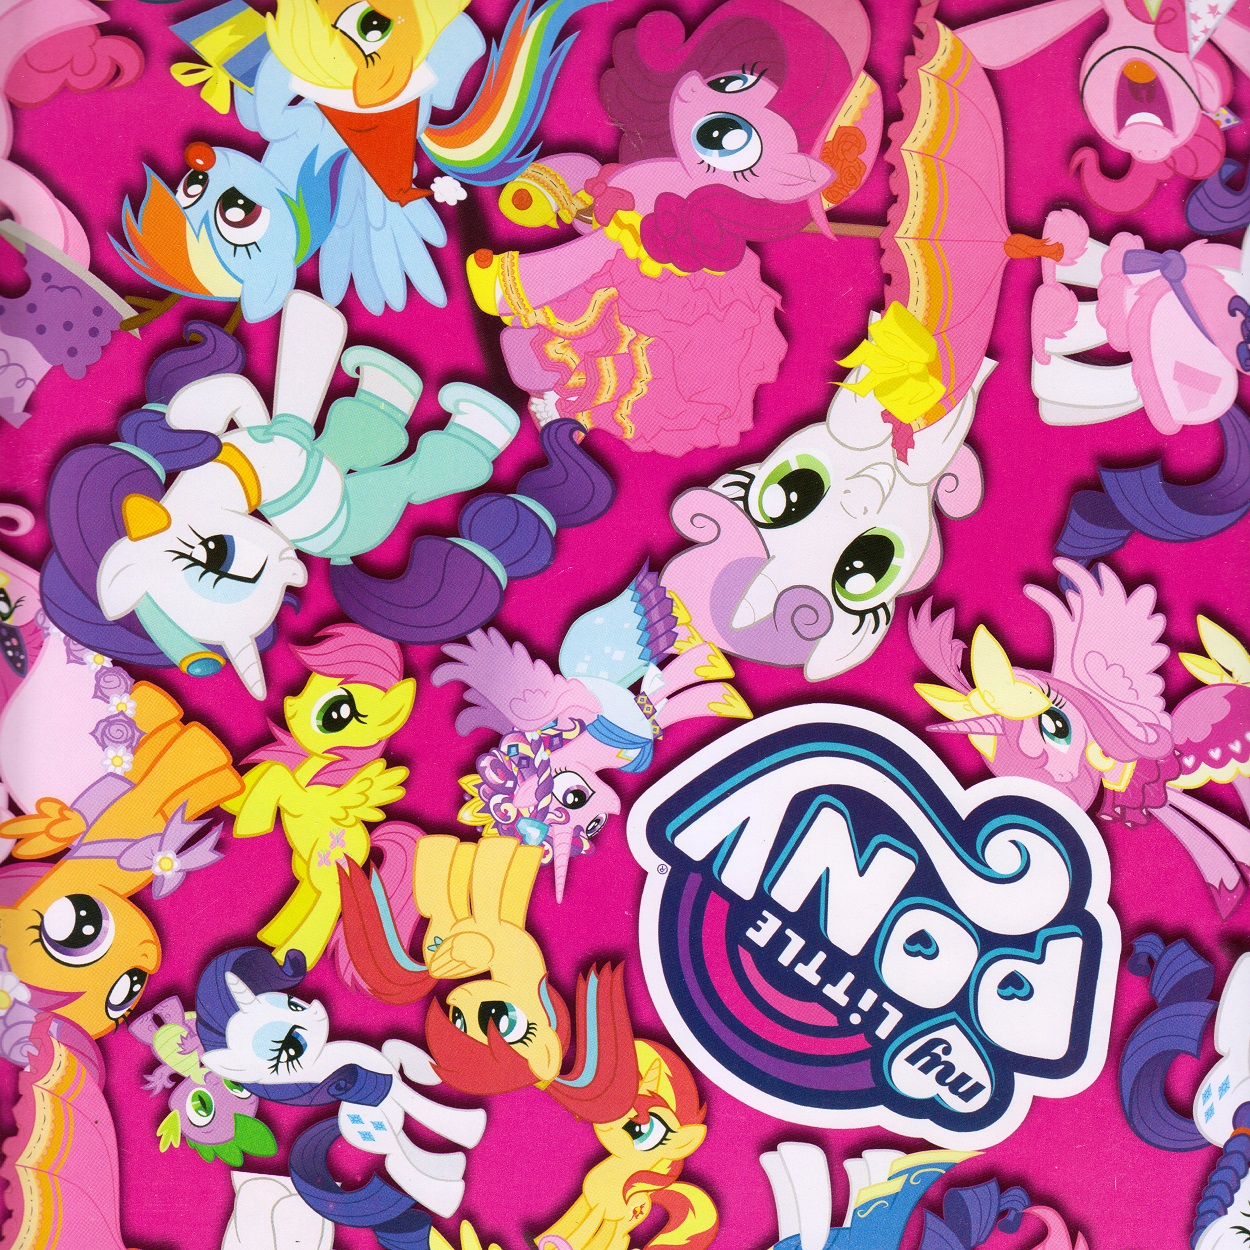 کاغذ کادو طرح little pony کد 23